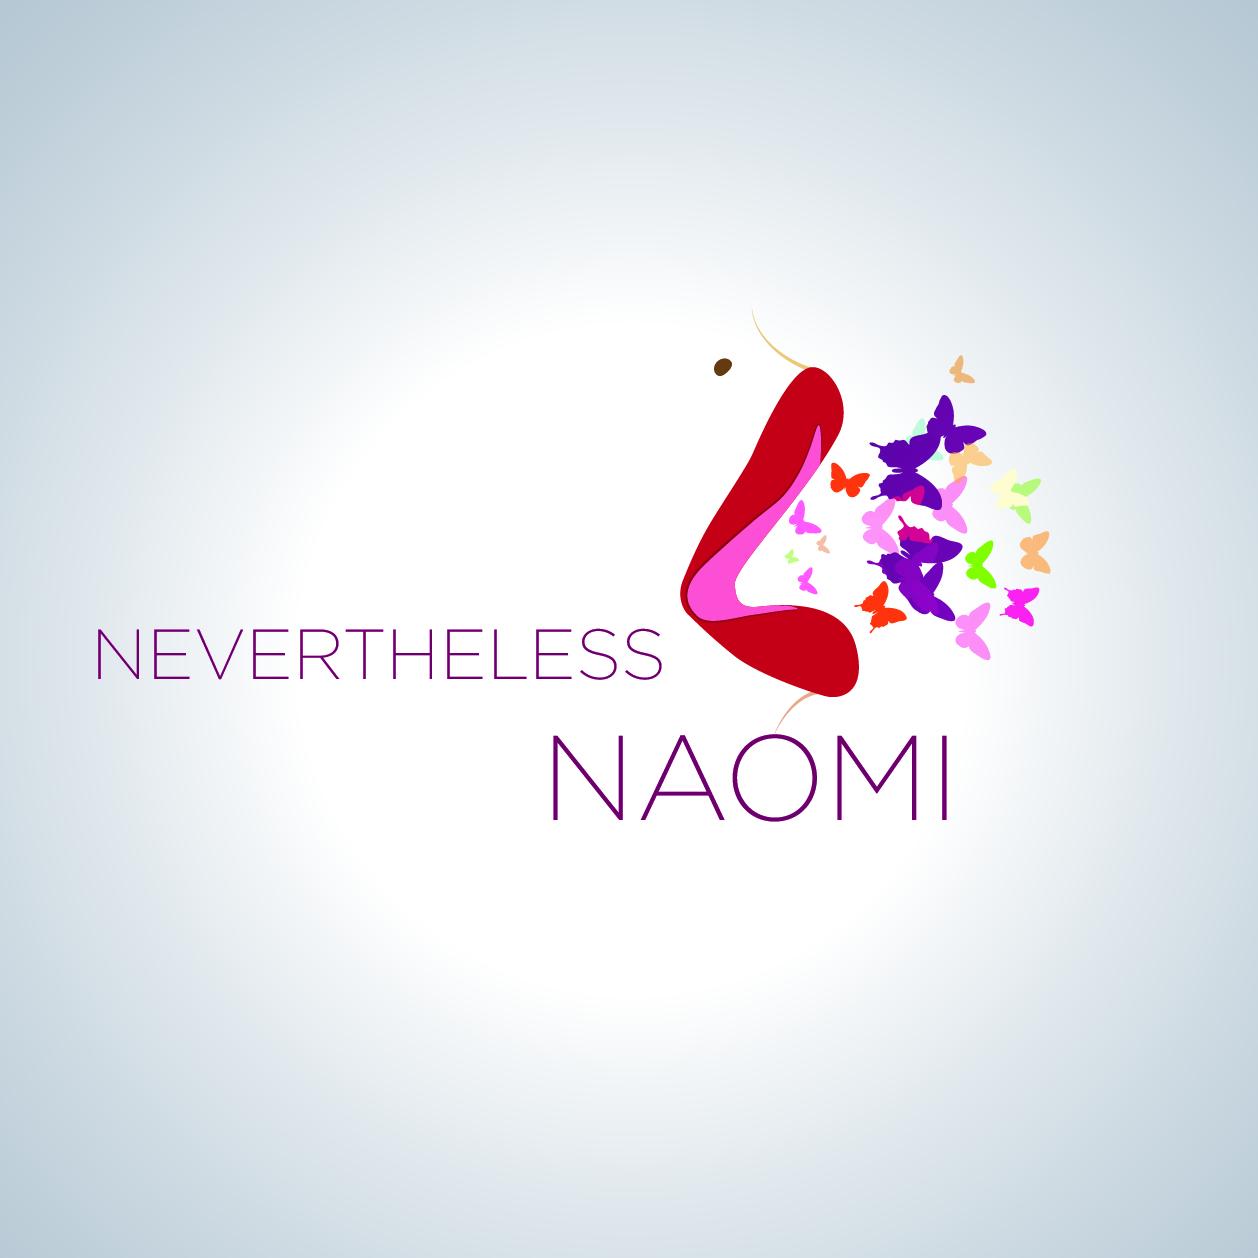 nevertheless naomi-01.jpg